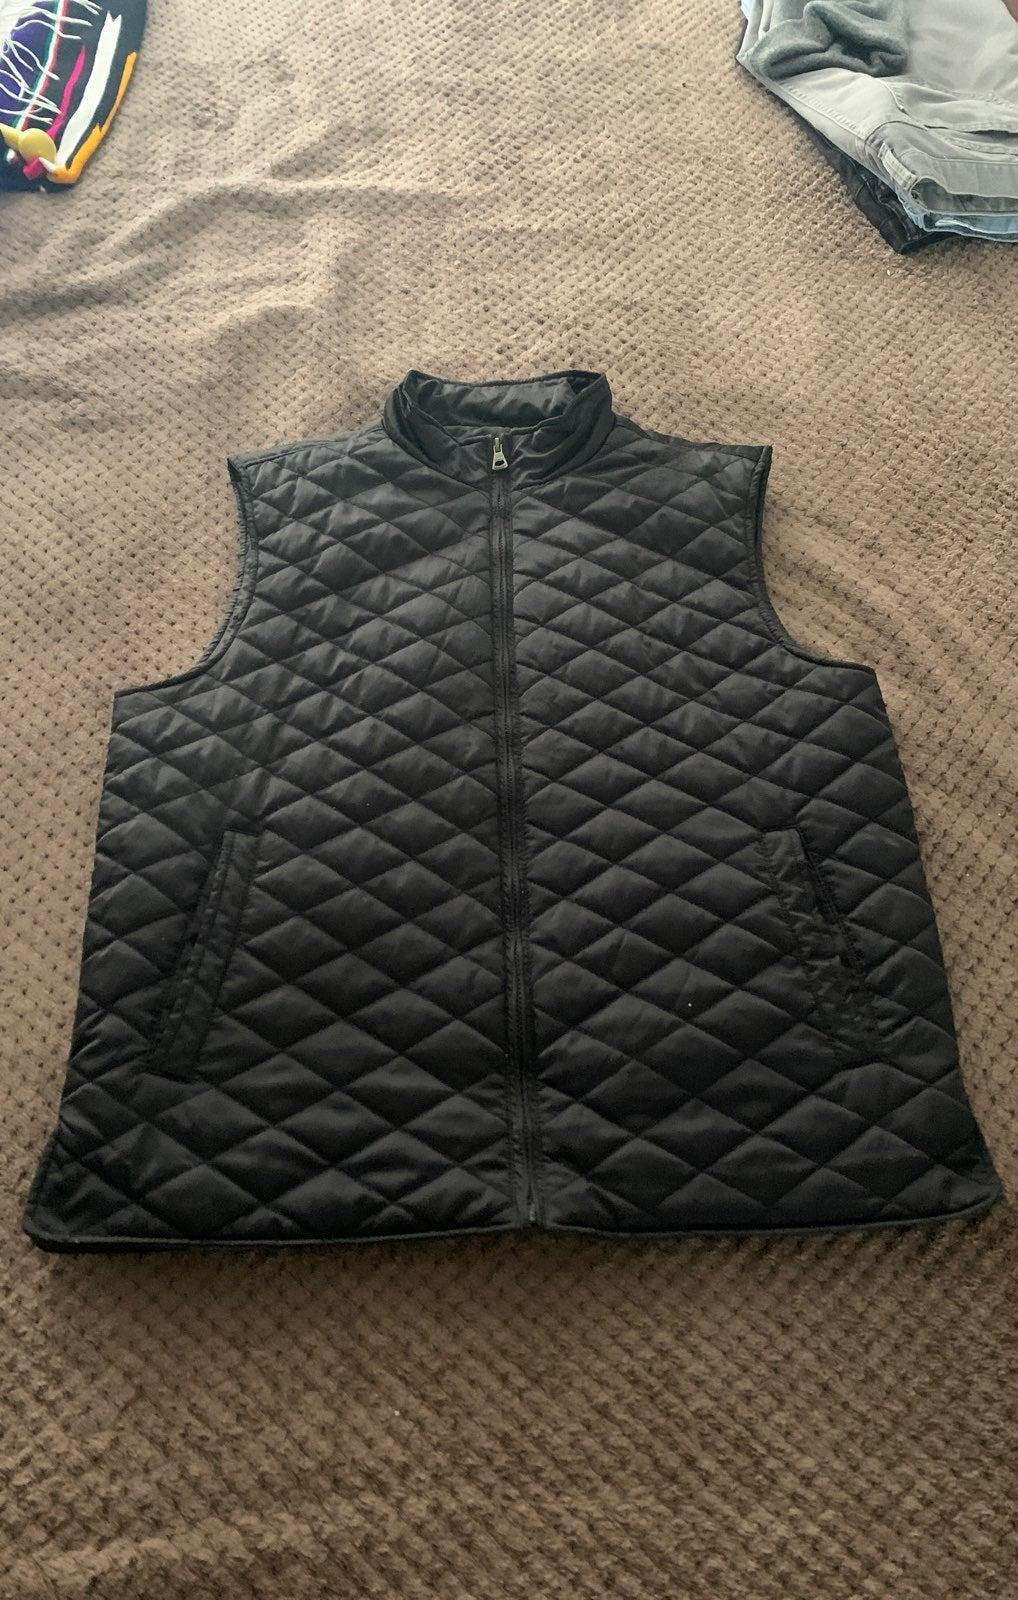 Weatherproof Vintage Quilted Vest